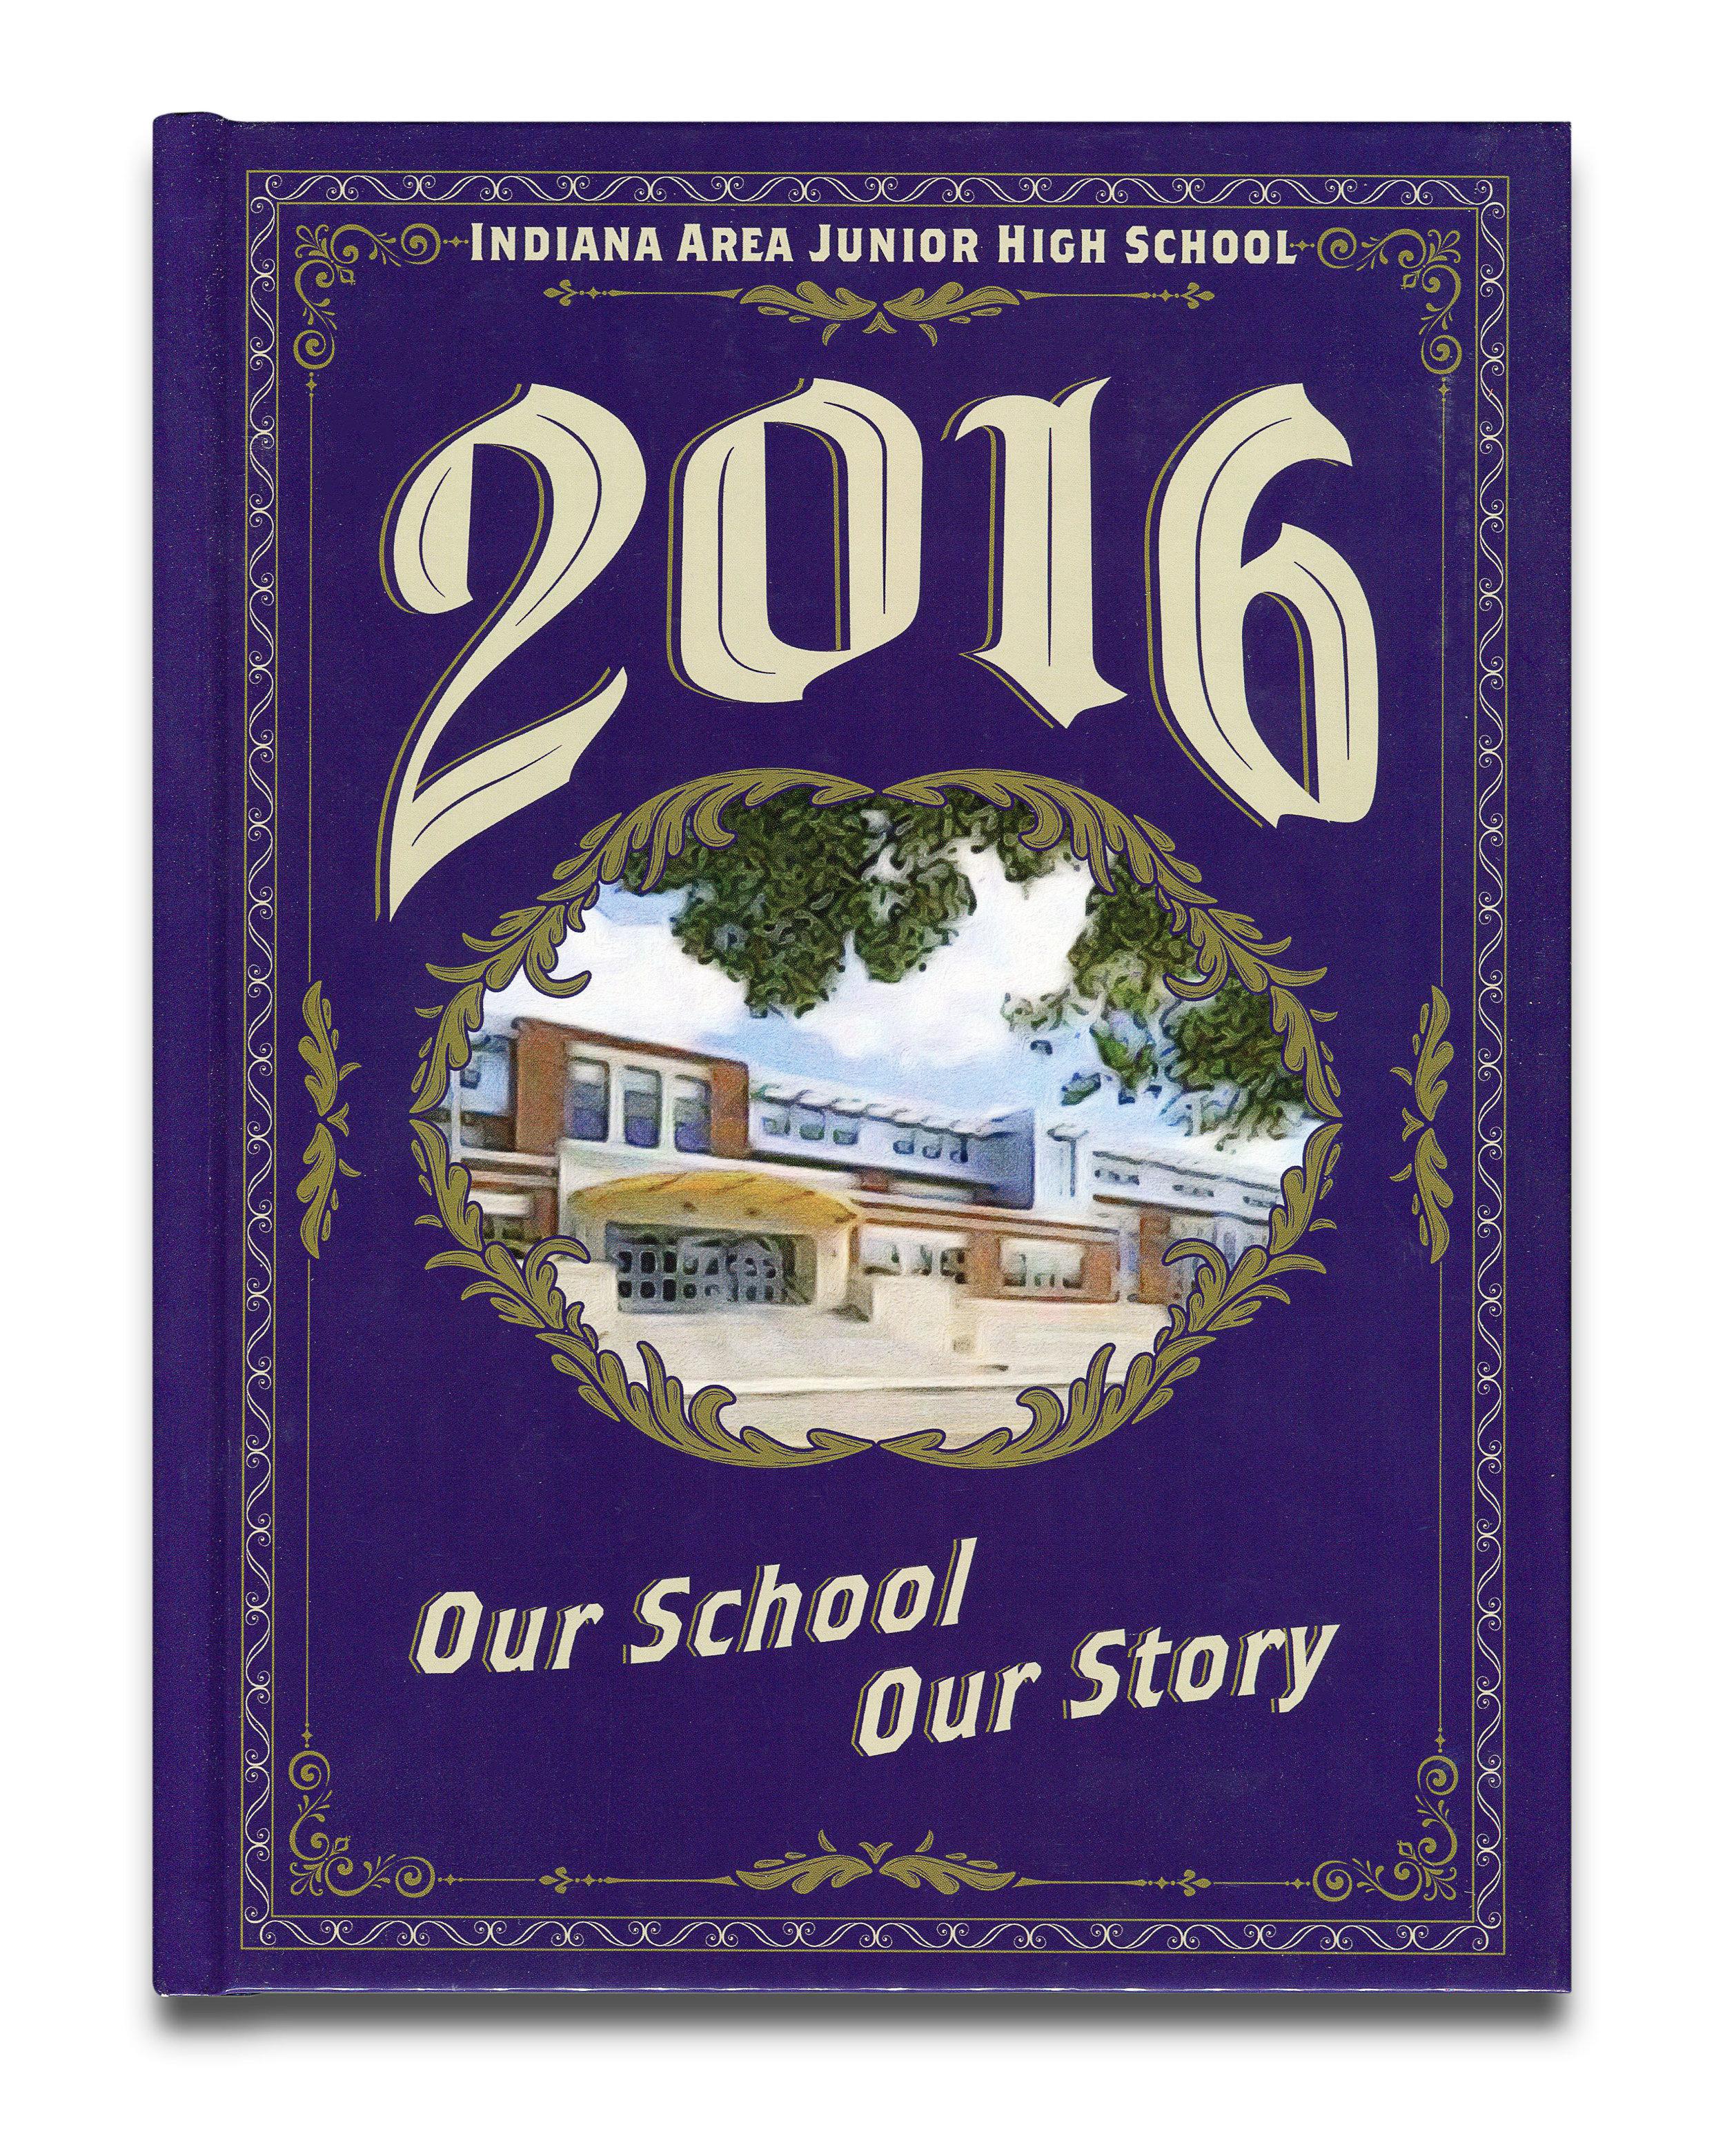 2016_Yearbook_Front_Details.jpg